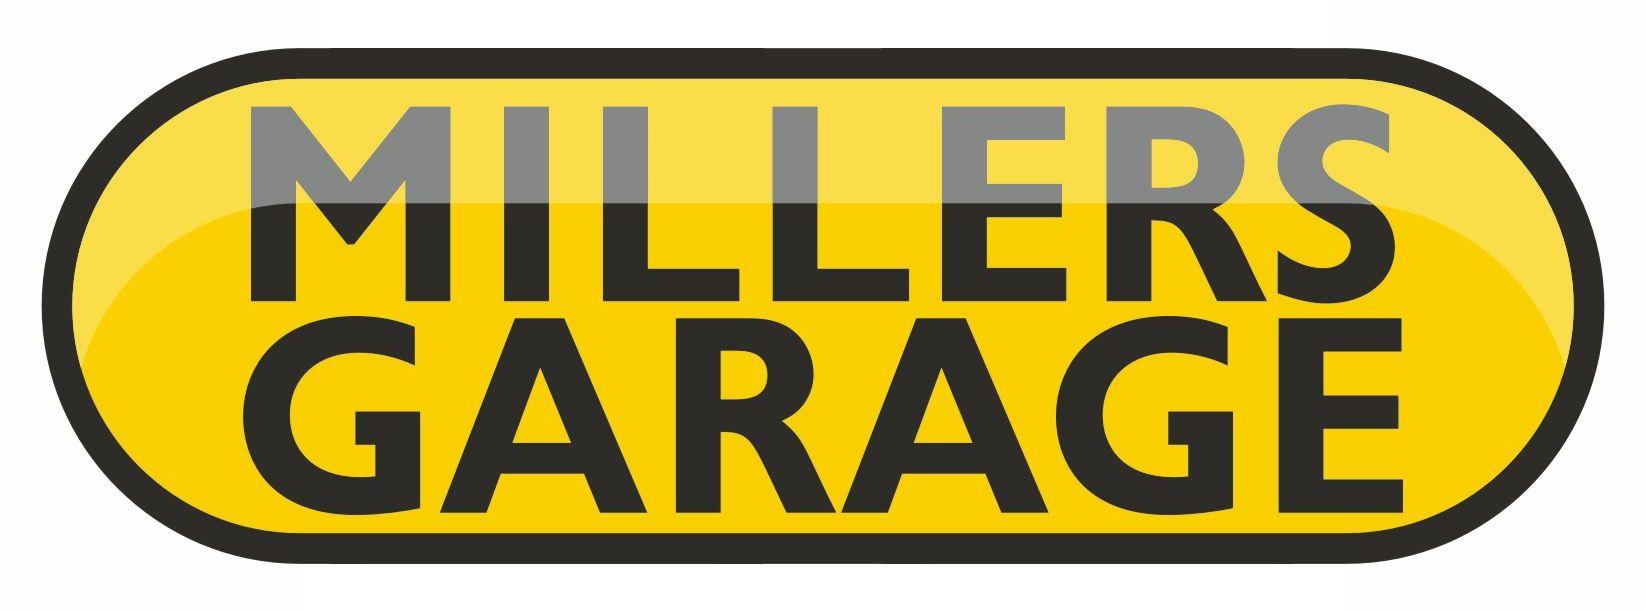 Millers garage limited